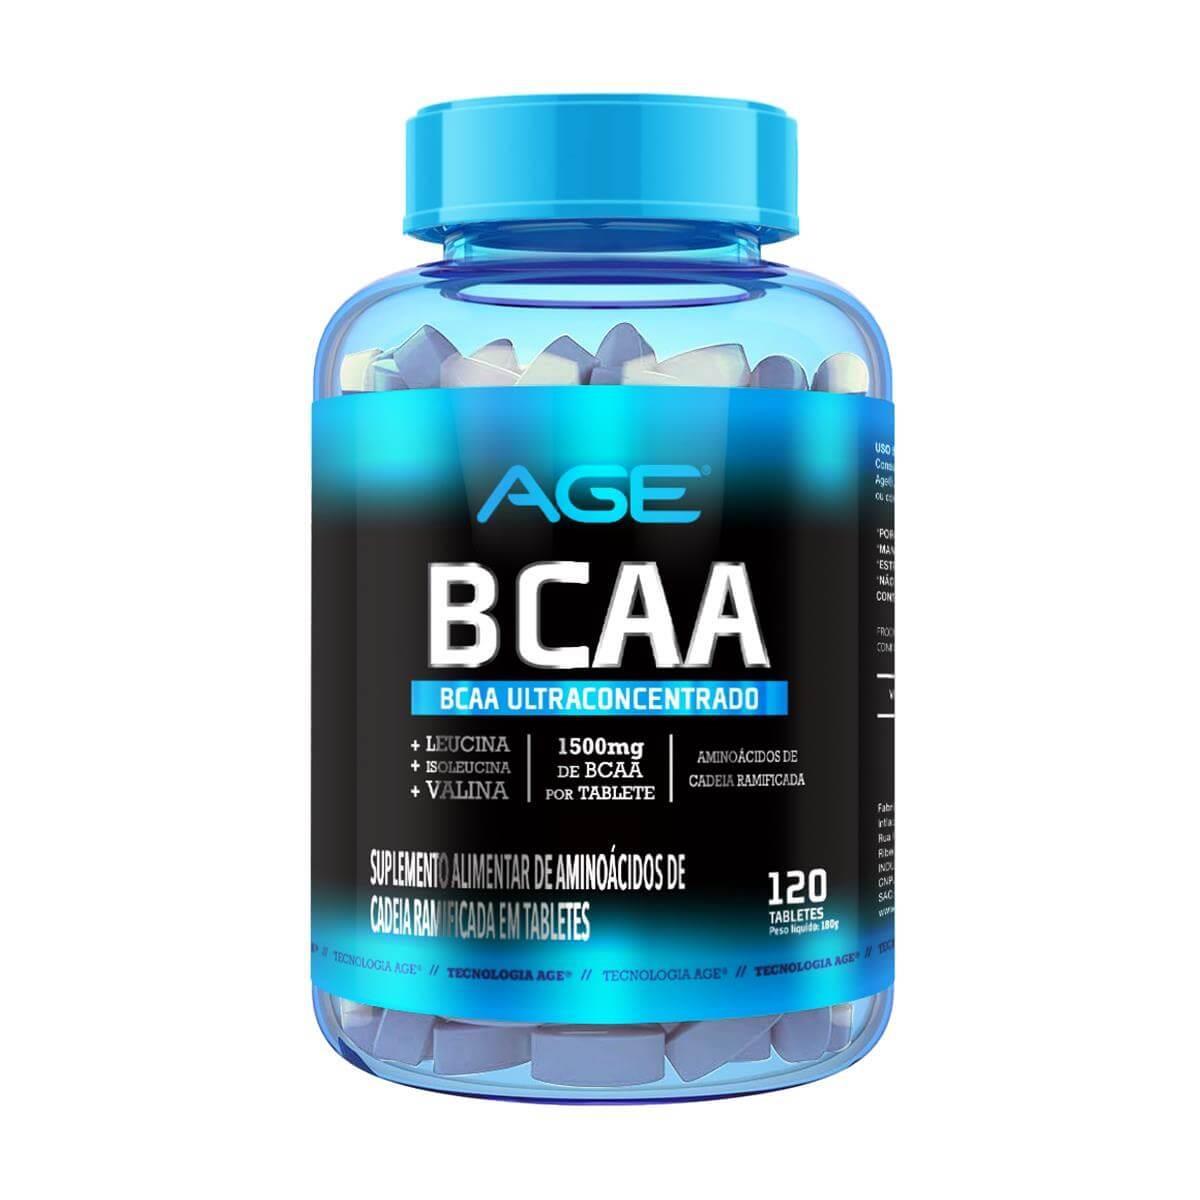 BCAA AGE (120 Tabletes - 1500MG) - AGE